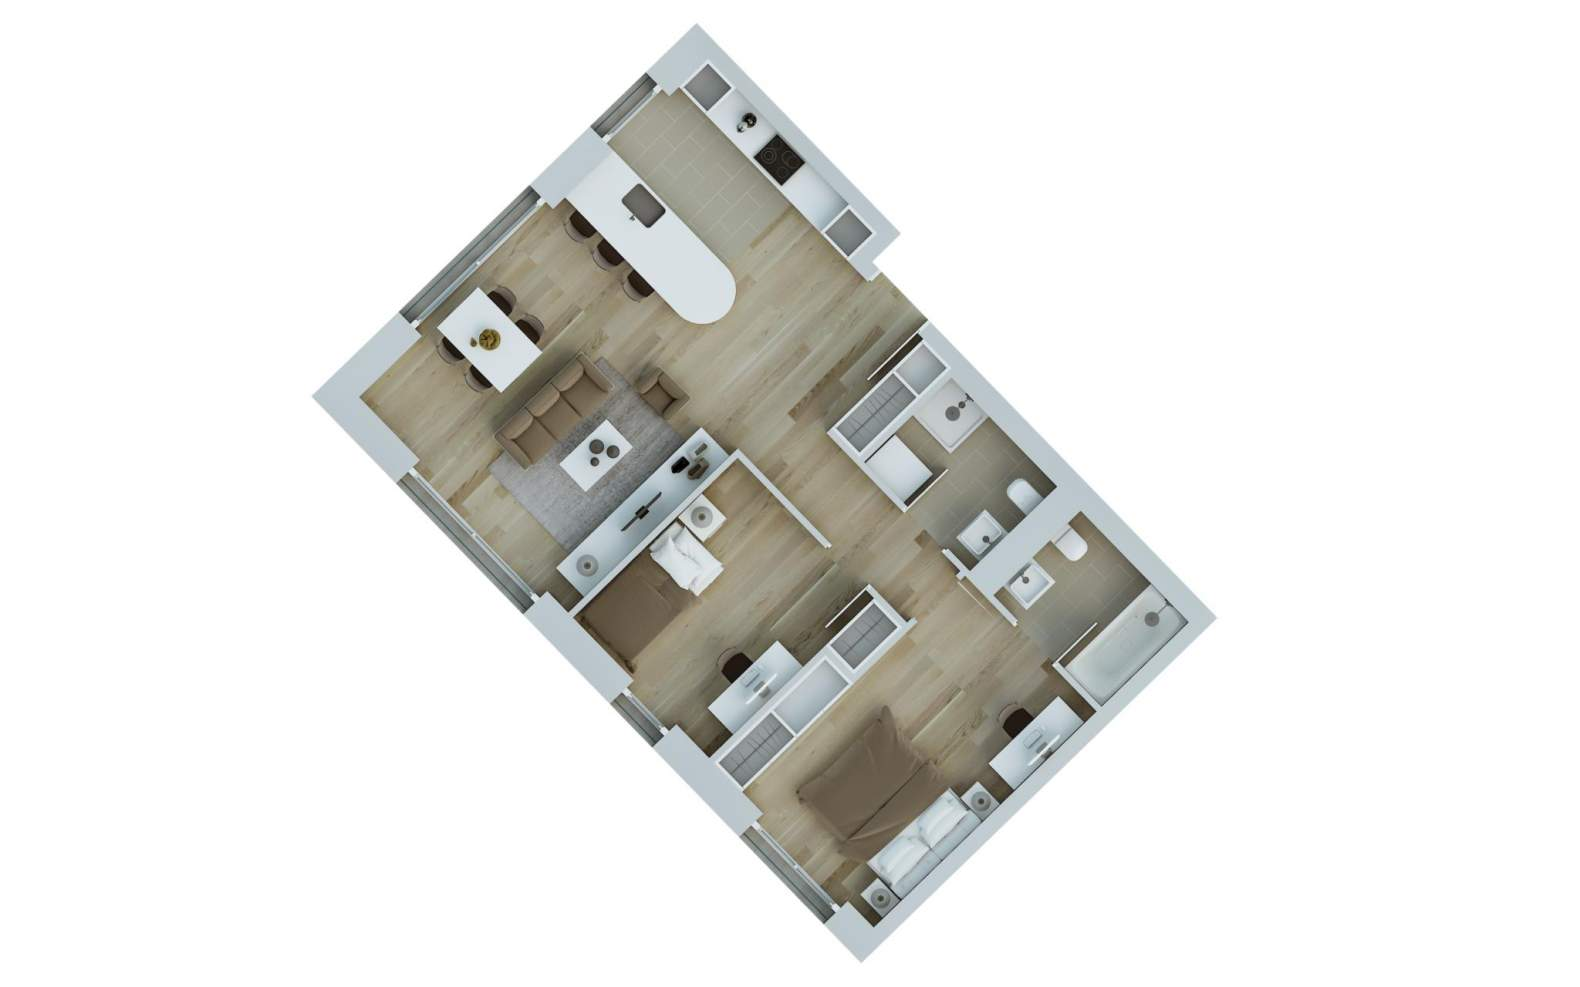 Chêne-Bourg  - Appartement 4 Pièces 2 Chambres - picture 5